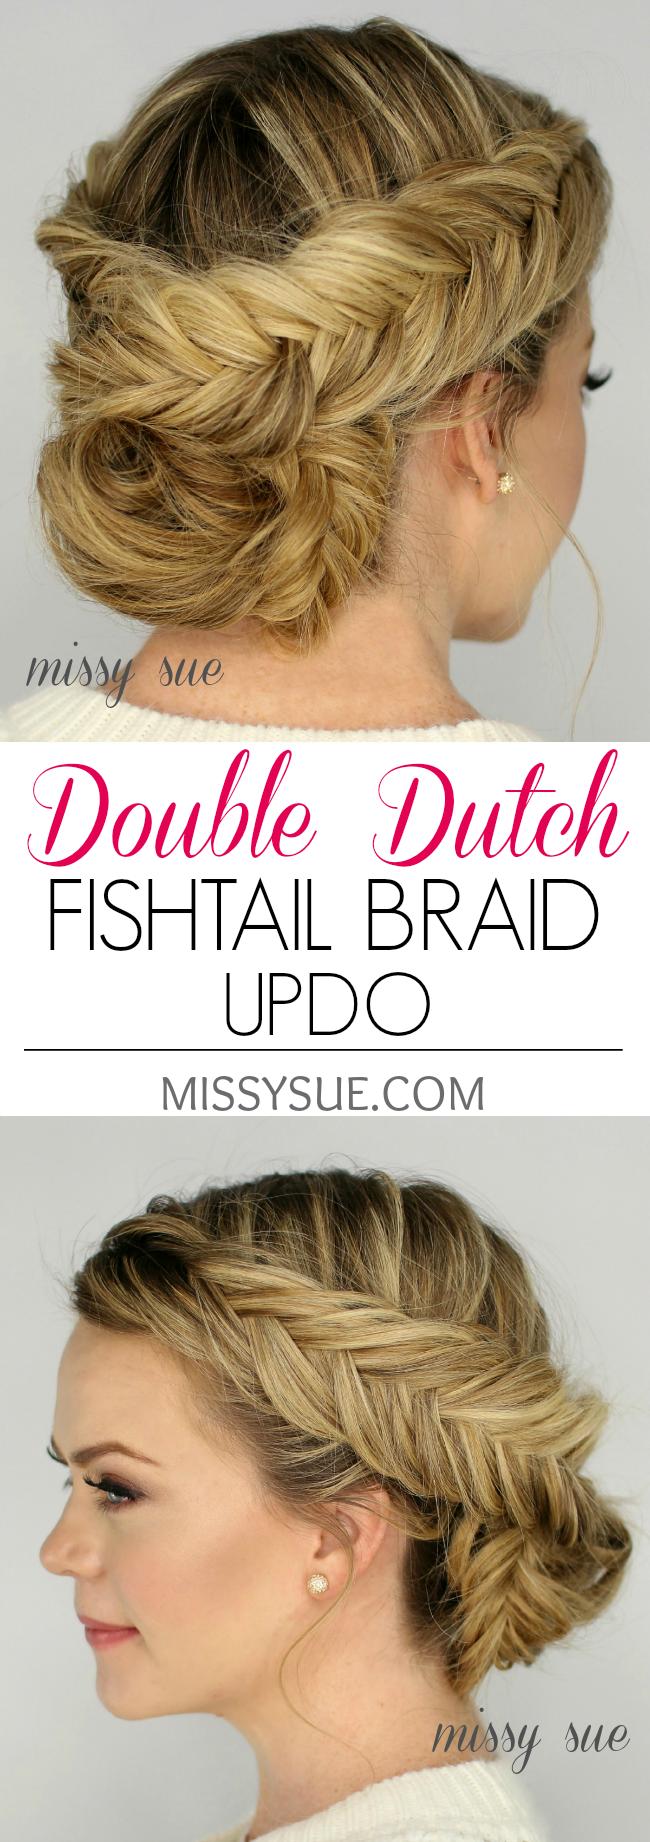 Double dutch fishtail braid updo hair pinterest fishtail